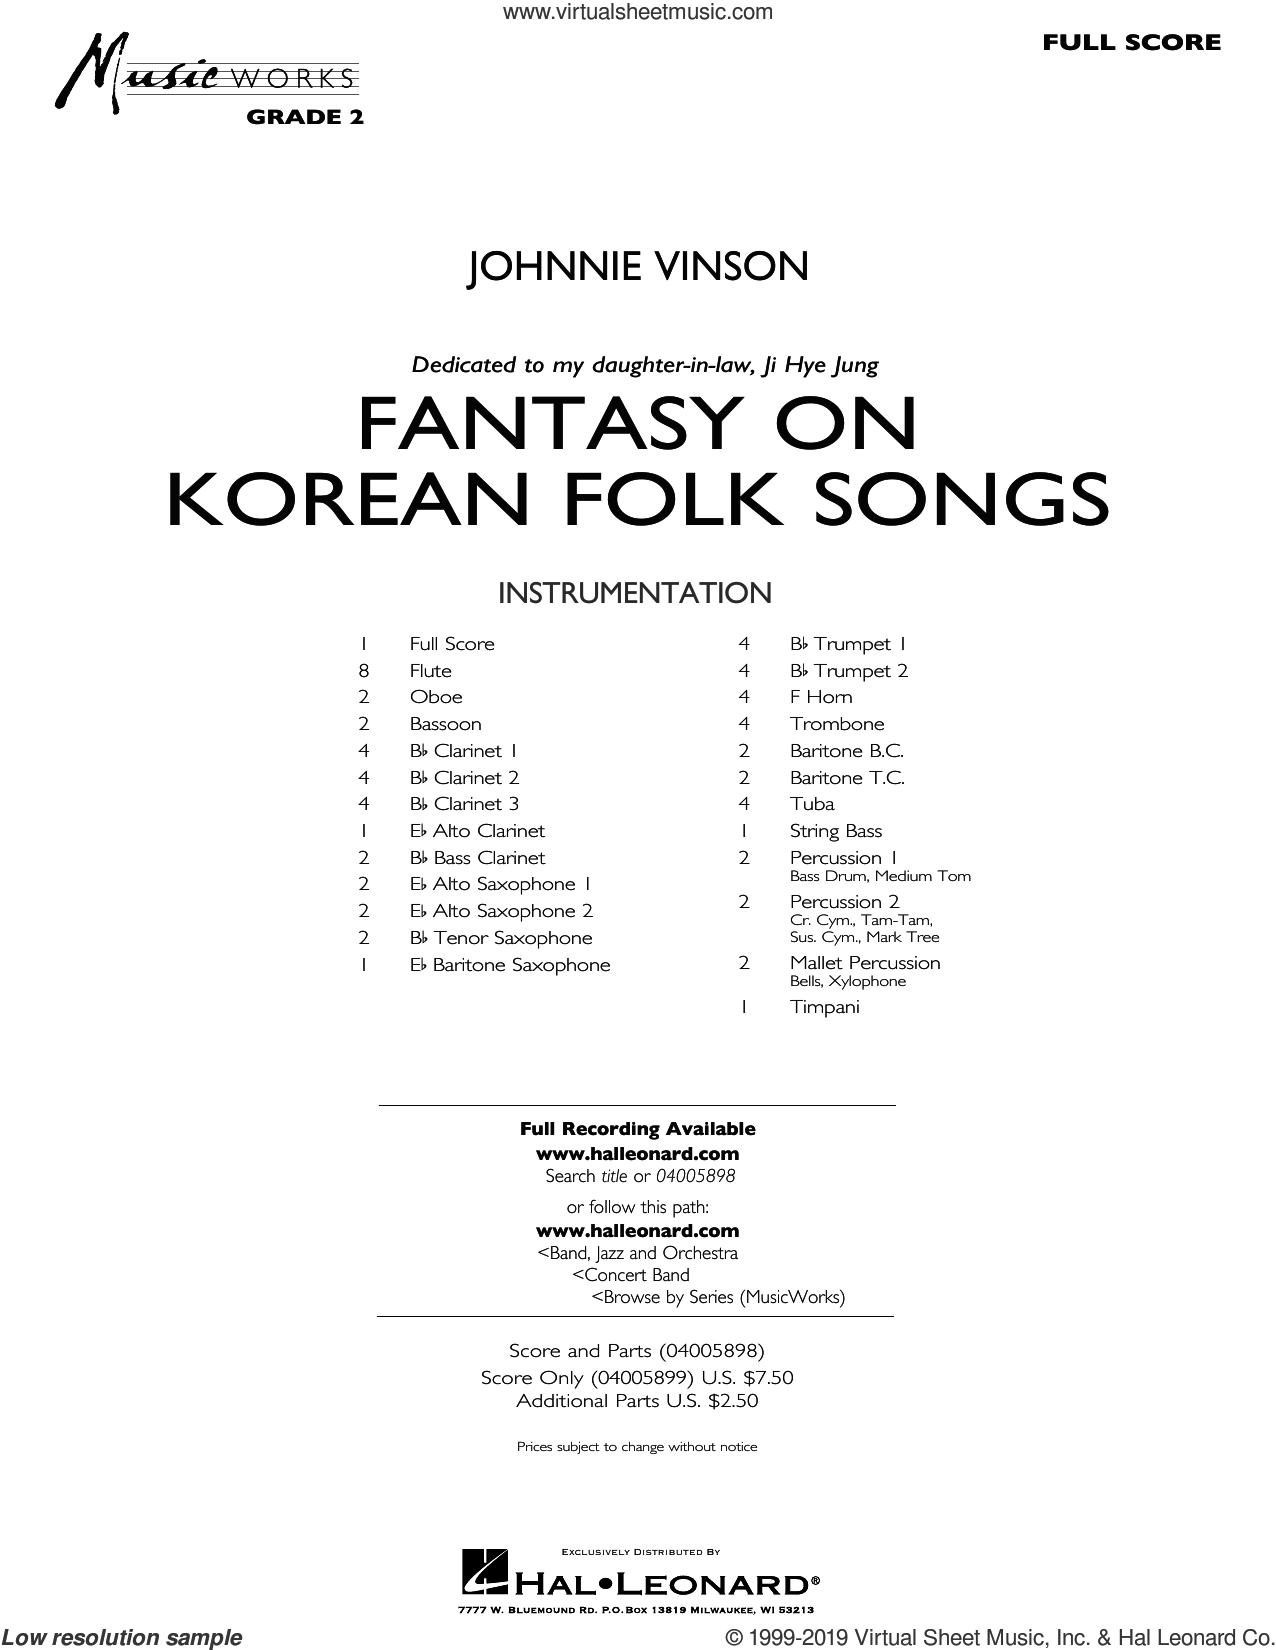 Fantasy on Korean Folk Songs (COMPLETE) sheet music for concert band by Johnnie Vinson, intermediate skill level